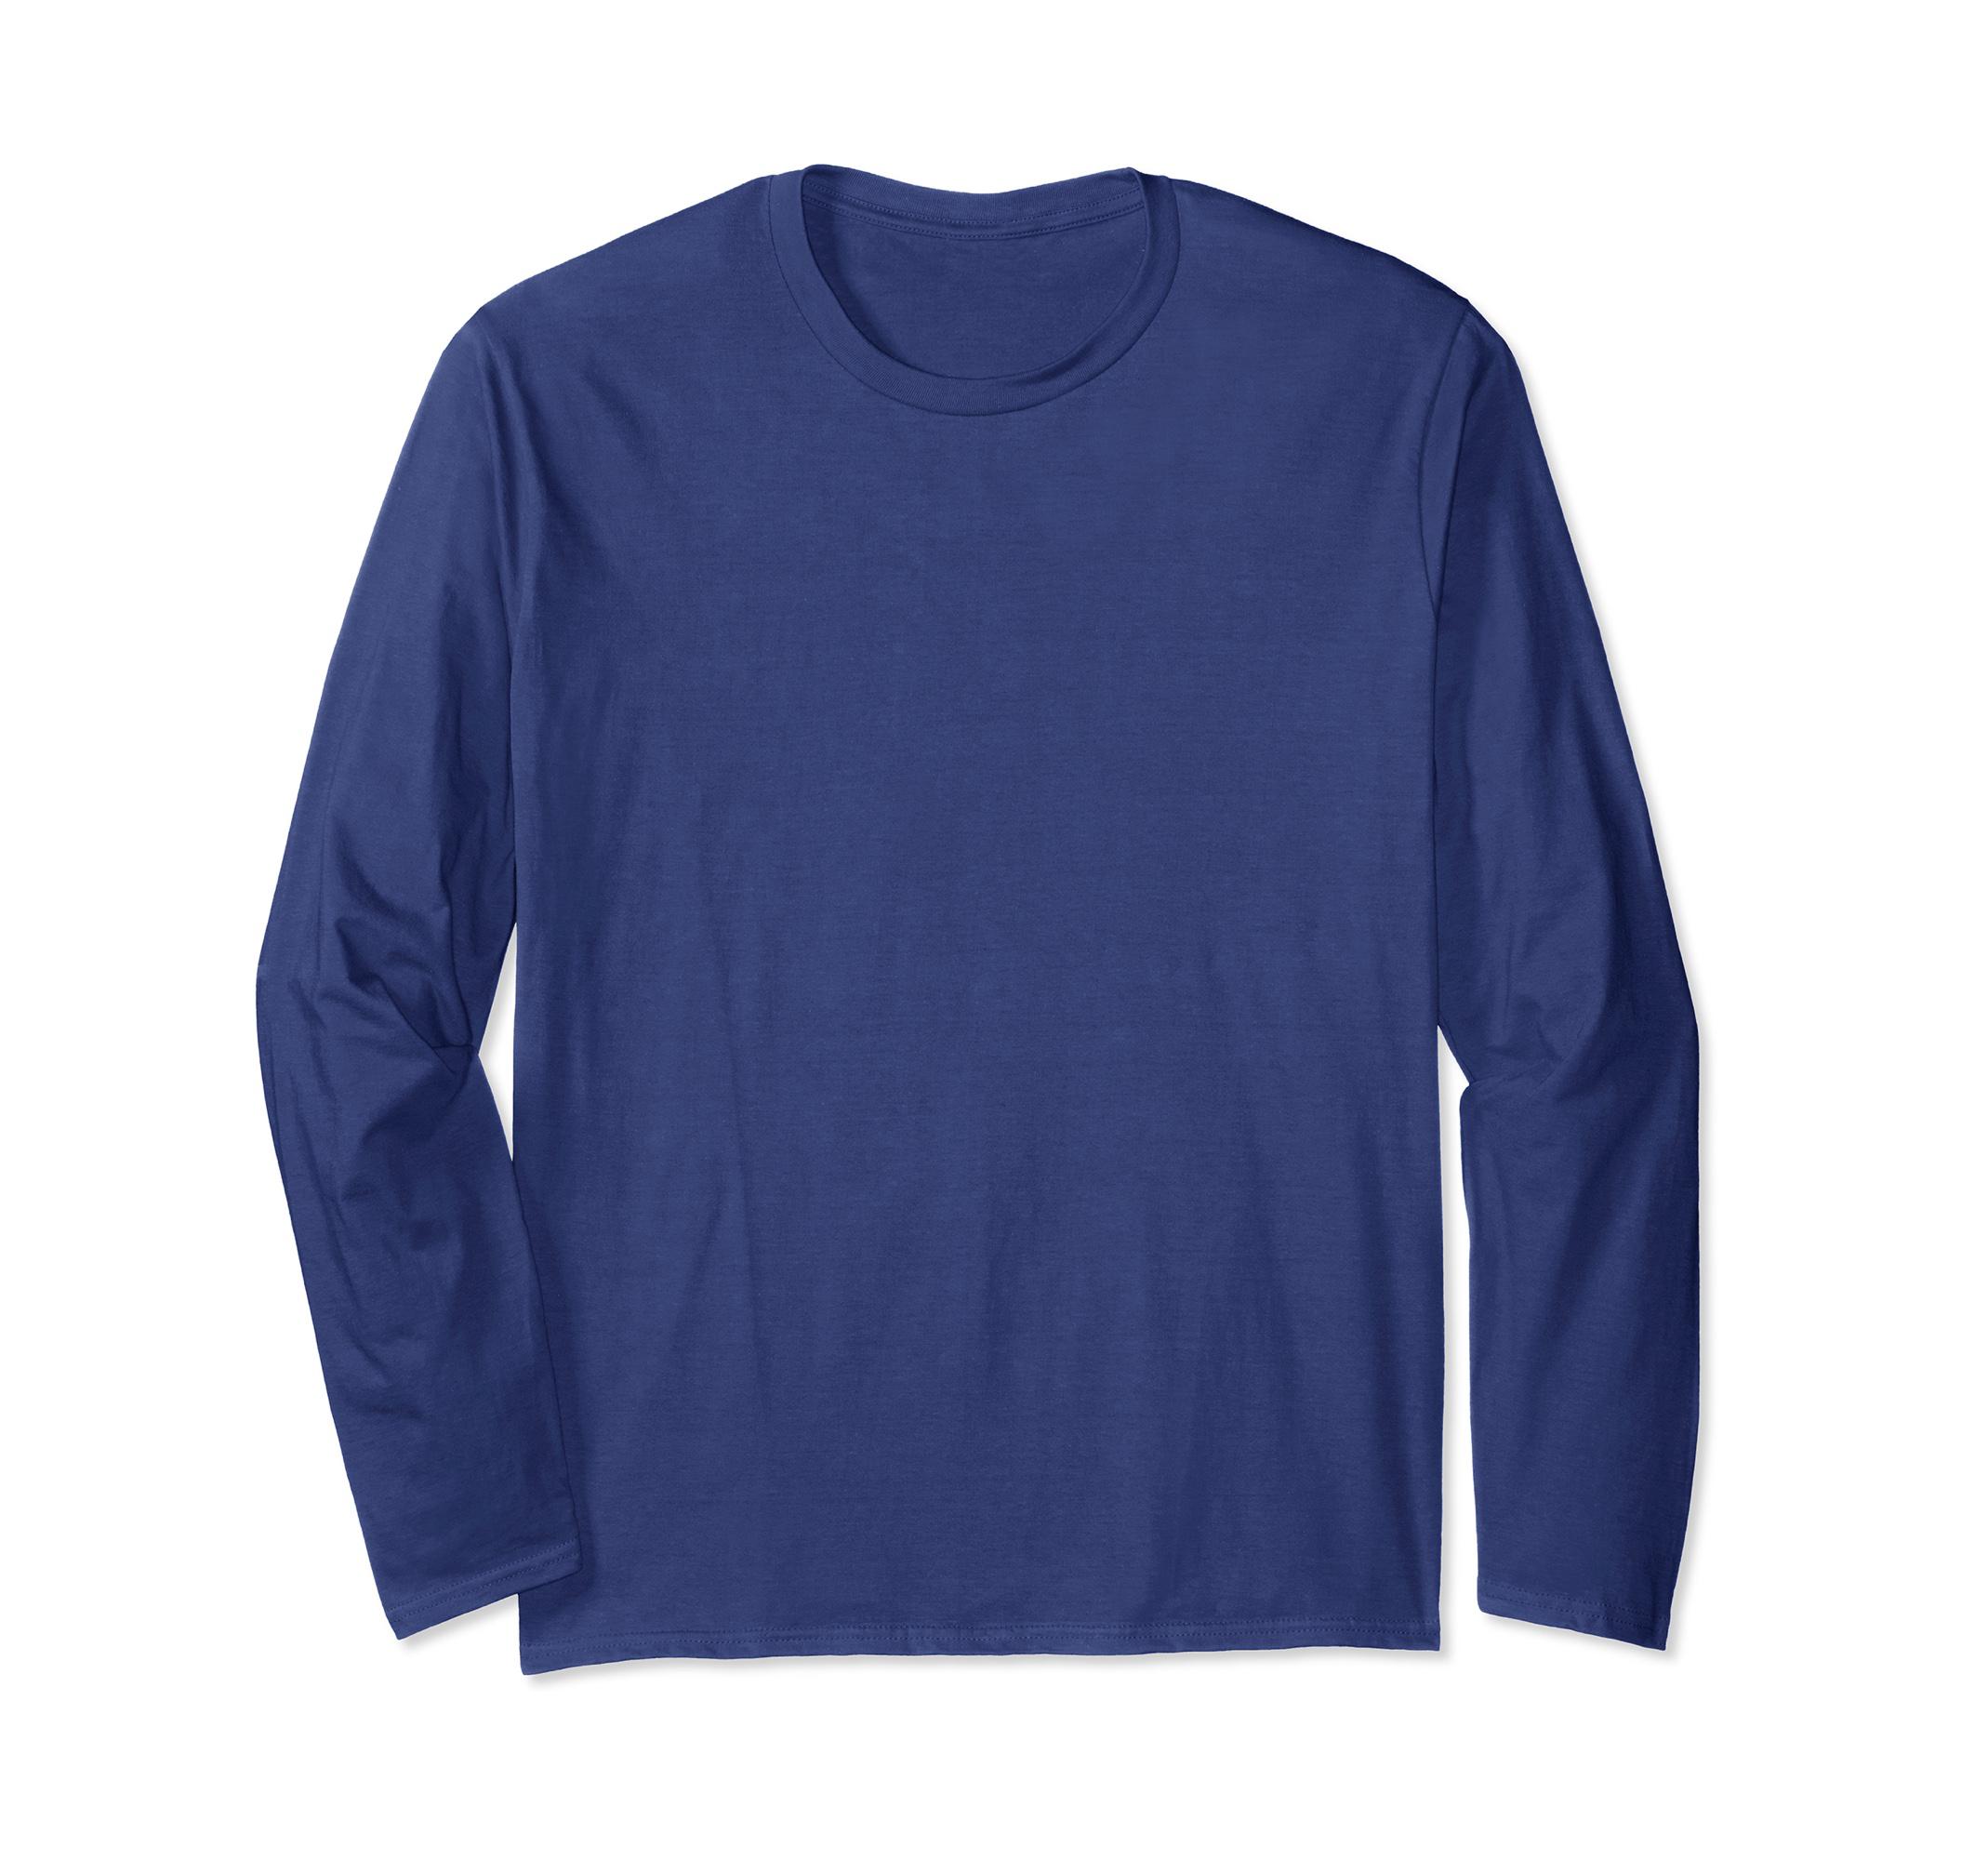 Happy Llamakkah Sweatshirt Hanukkah Holiday Sweater Holiday Gifts Llama Sweater